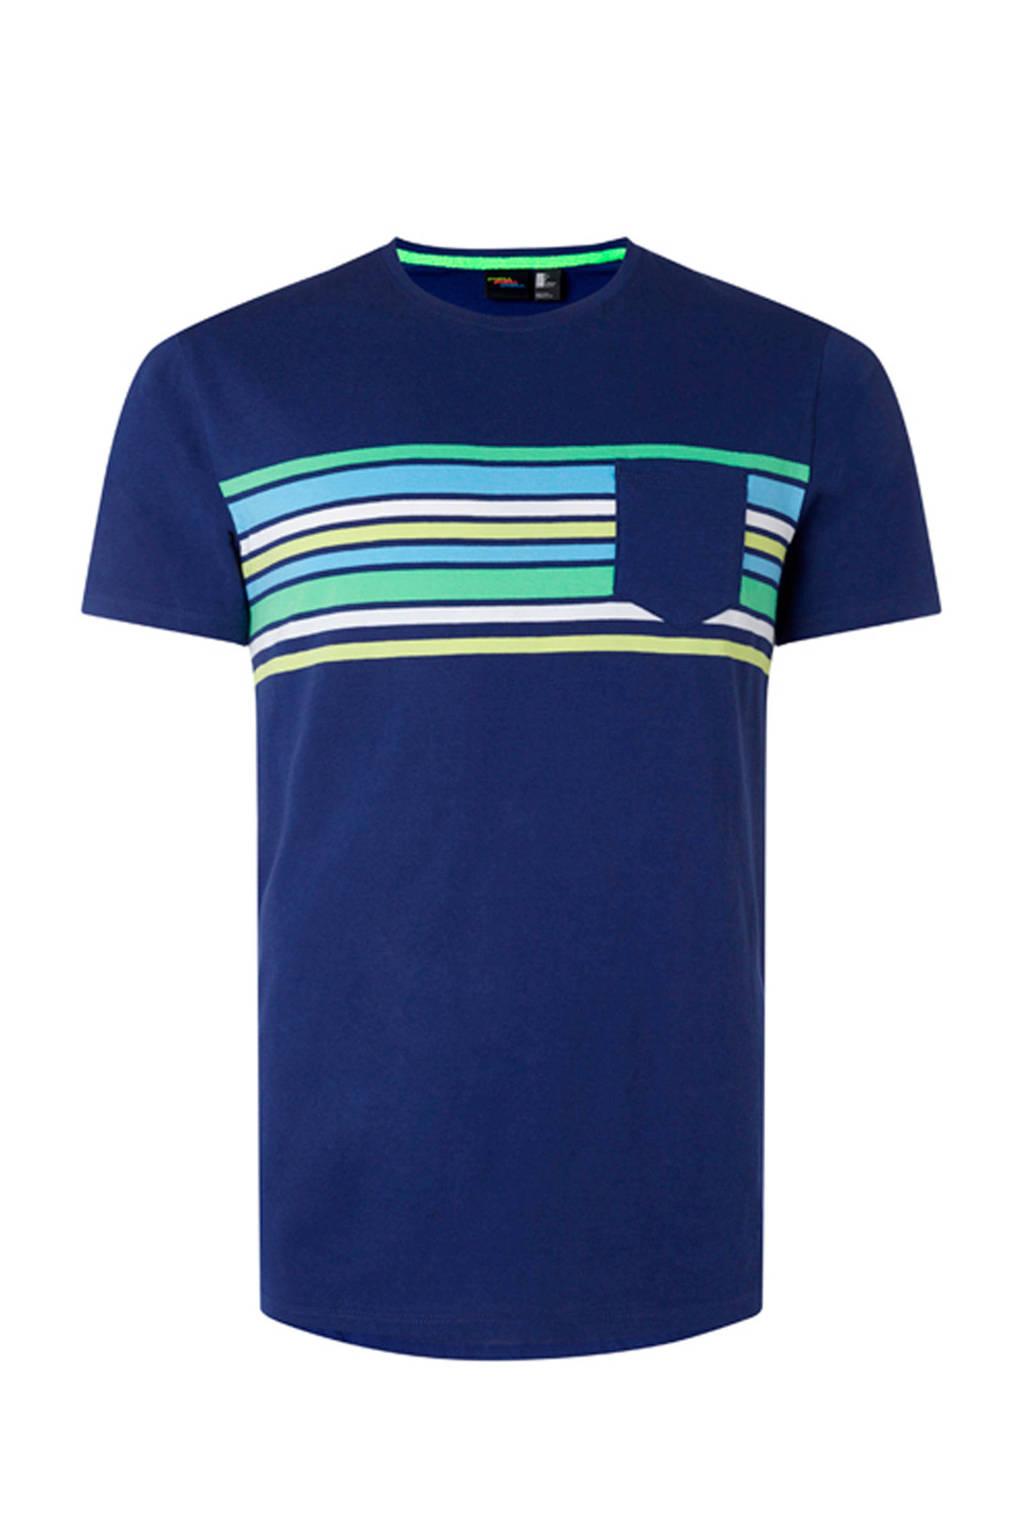 WE Fashion T-shirt met gestreept dessin, Donkerblauw